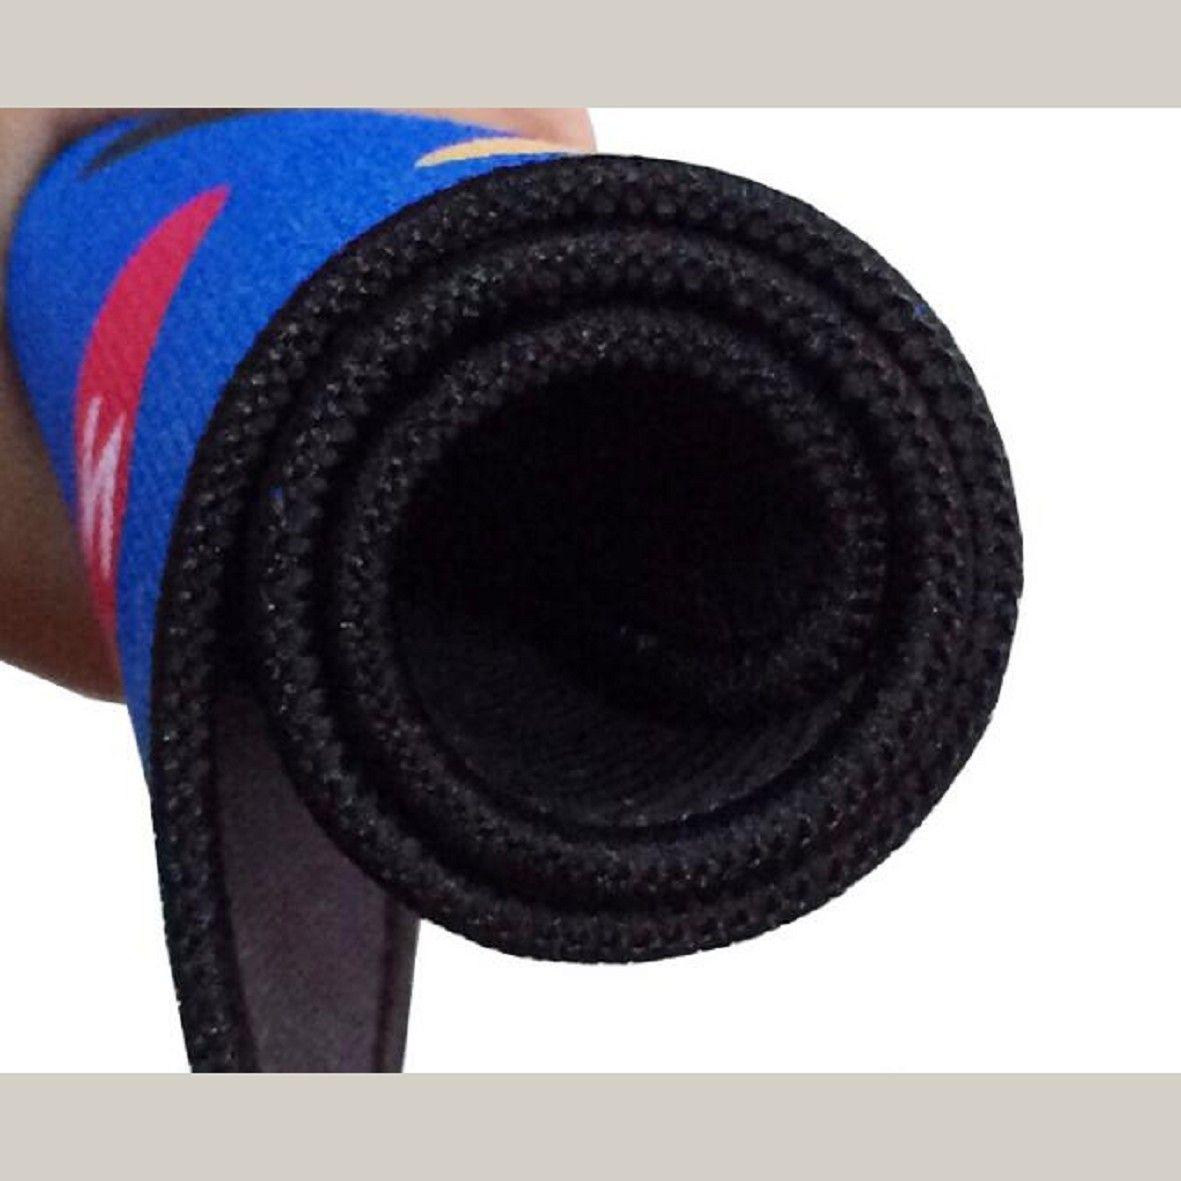 250mmX300mmX4mm verdickte mouse pad rutschfeste gummiboden Tuch oberfläche material präzision nähen kostenloser versand